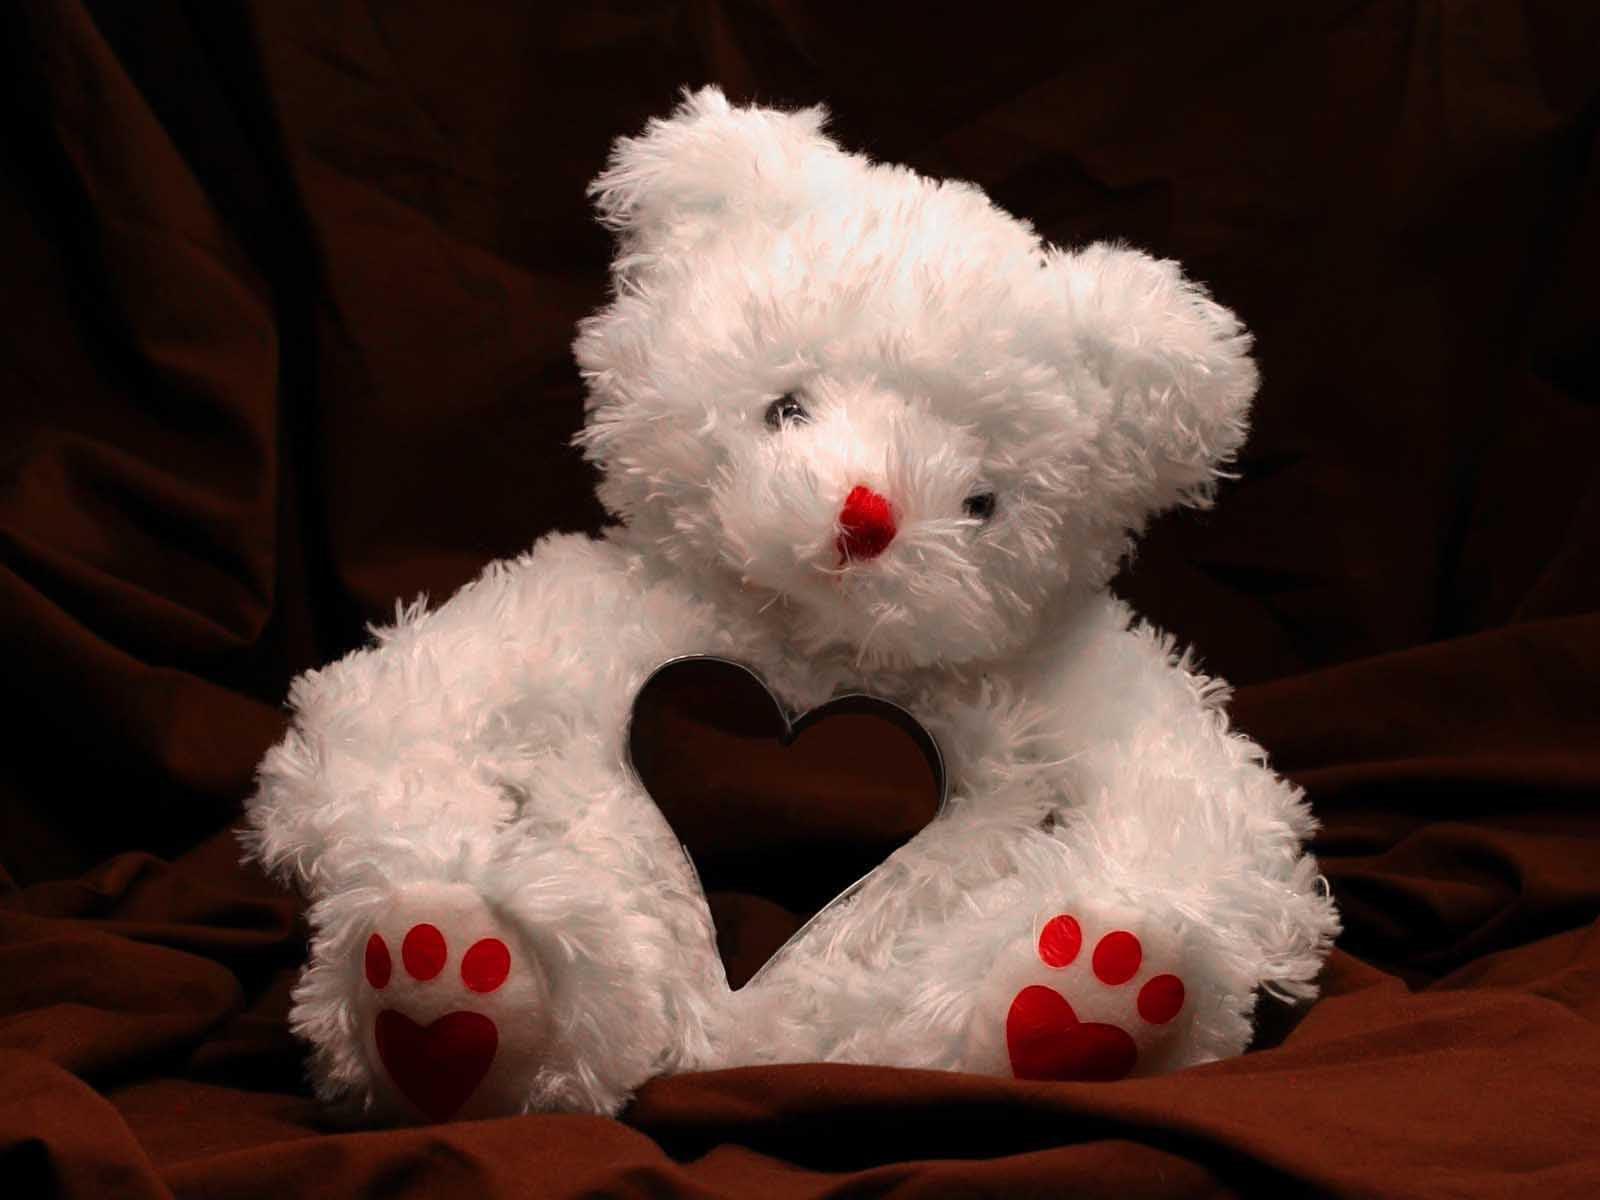 Love Teddy Bear Wallpapers